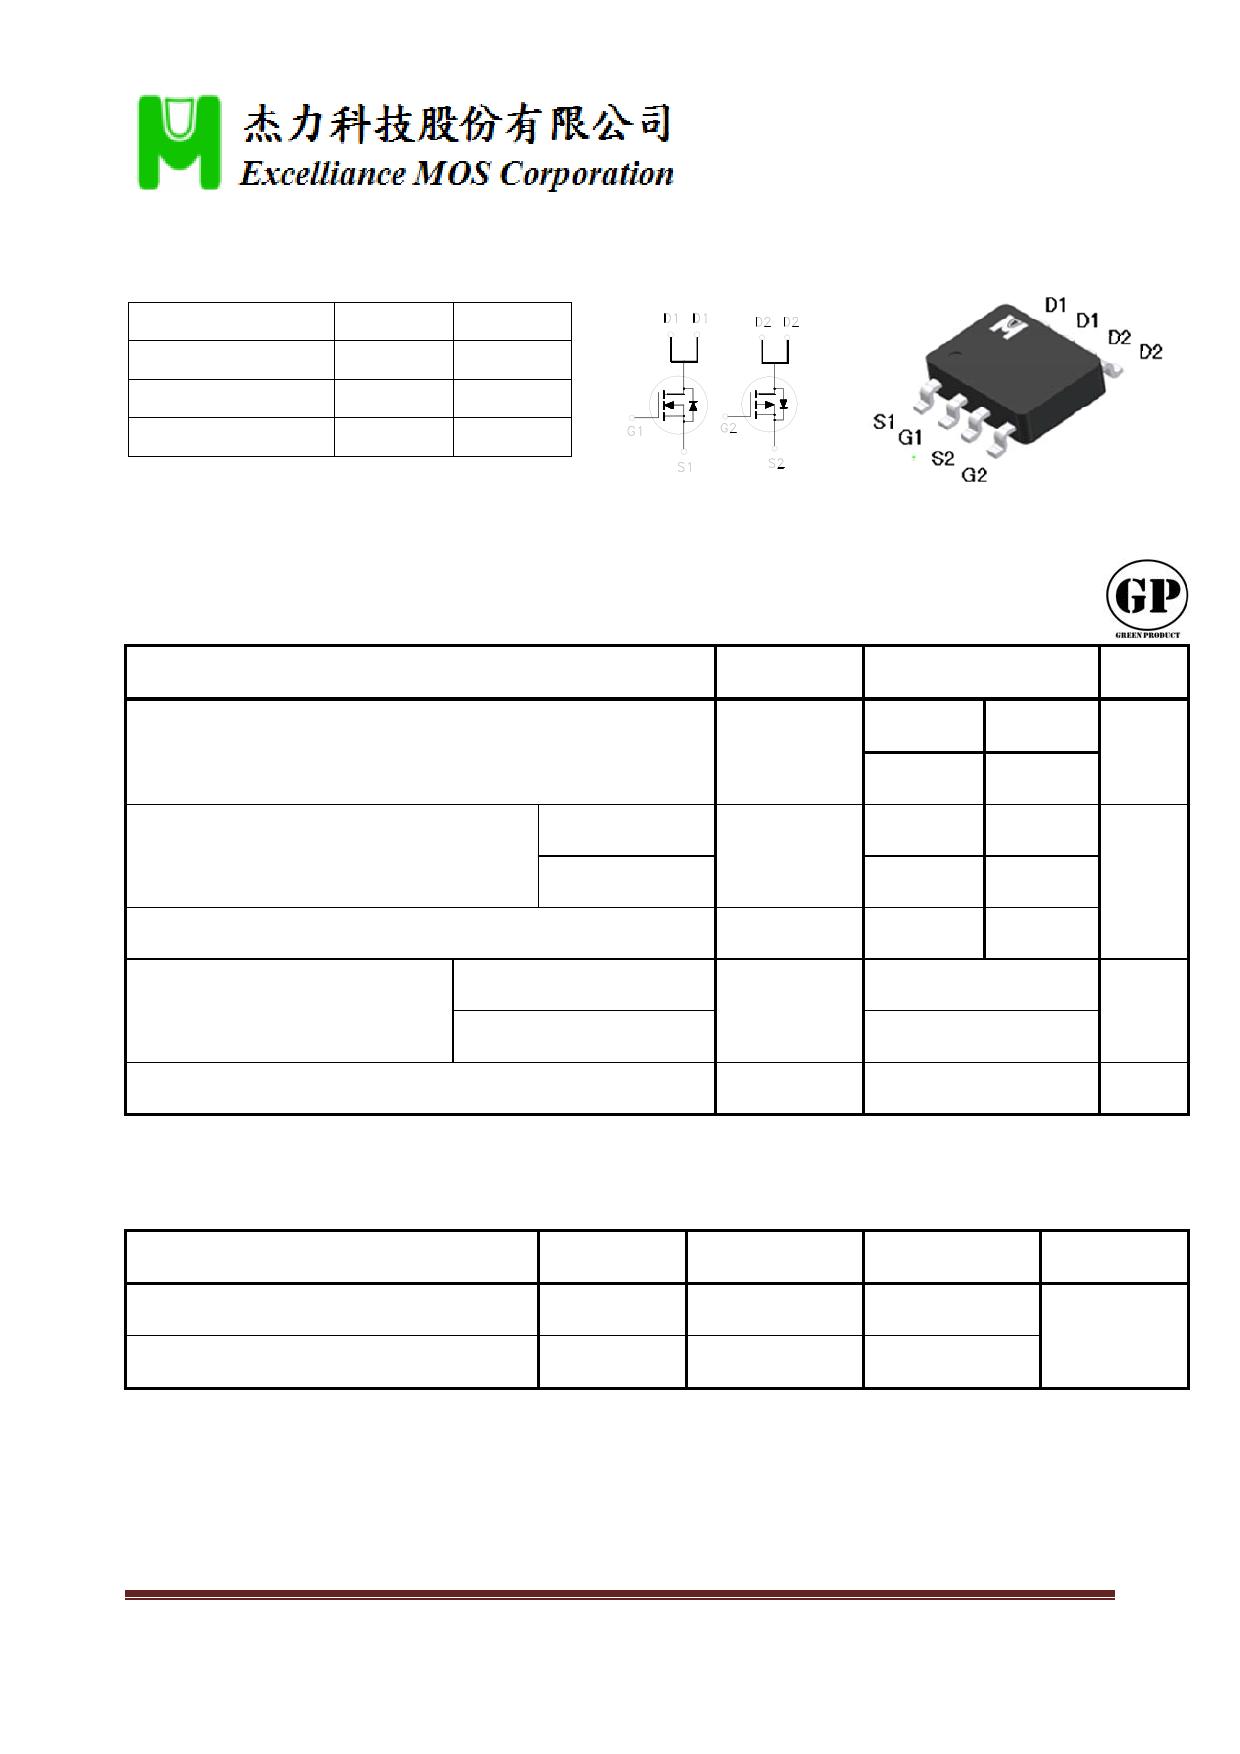 EMB28C03G دیتاشیت PDF